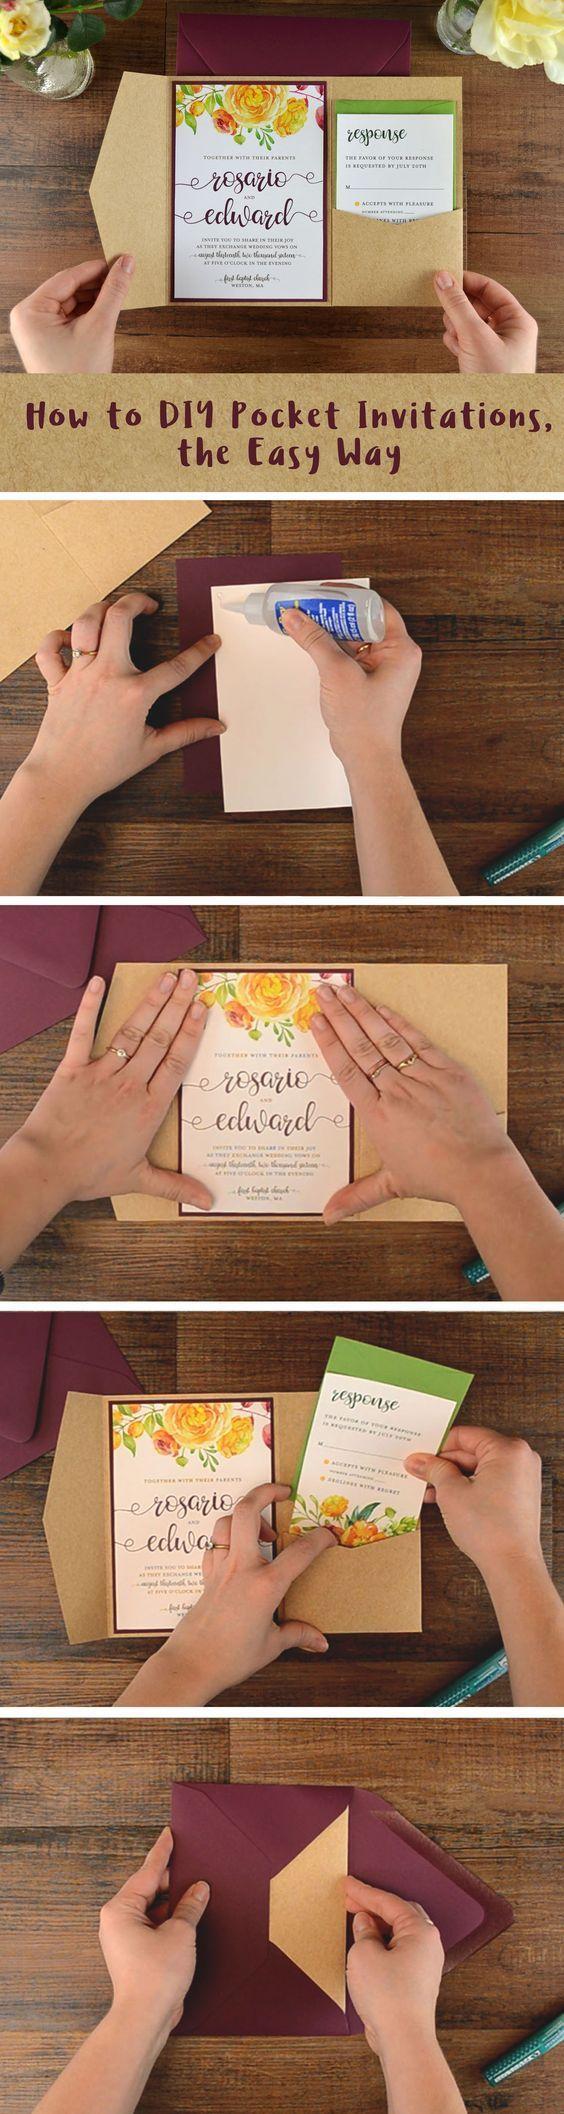 6f580b720dc449b182d2a8bed535b6c6 free invitation templates wedding stuff best 20 invitation design ideas on pinterest,Cheapest Way To Print Wedding Invitations